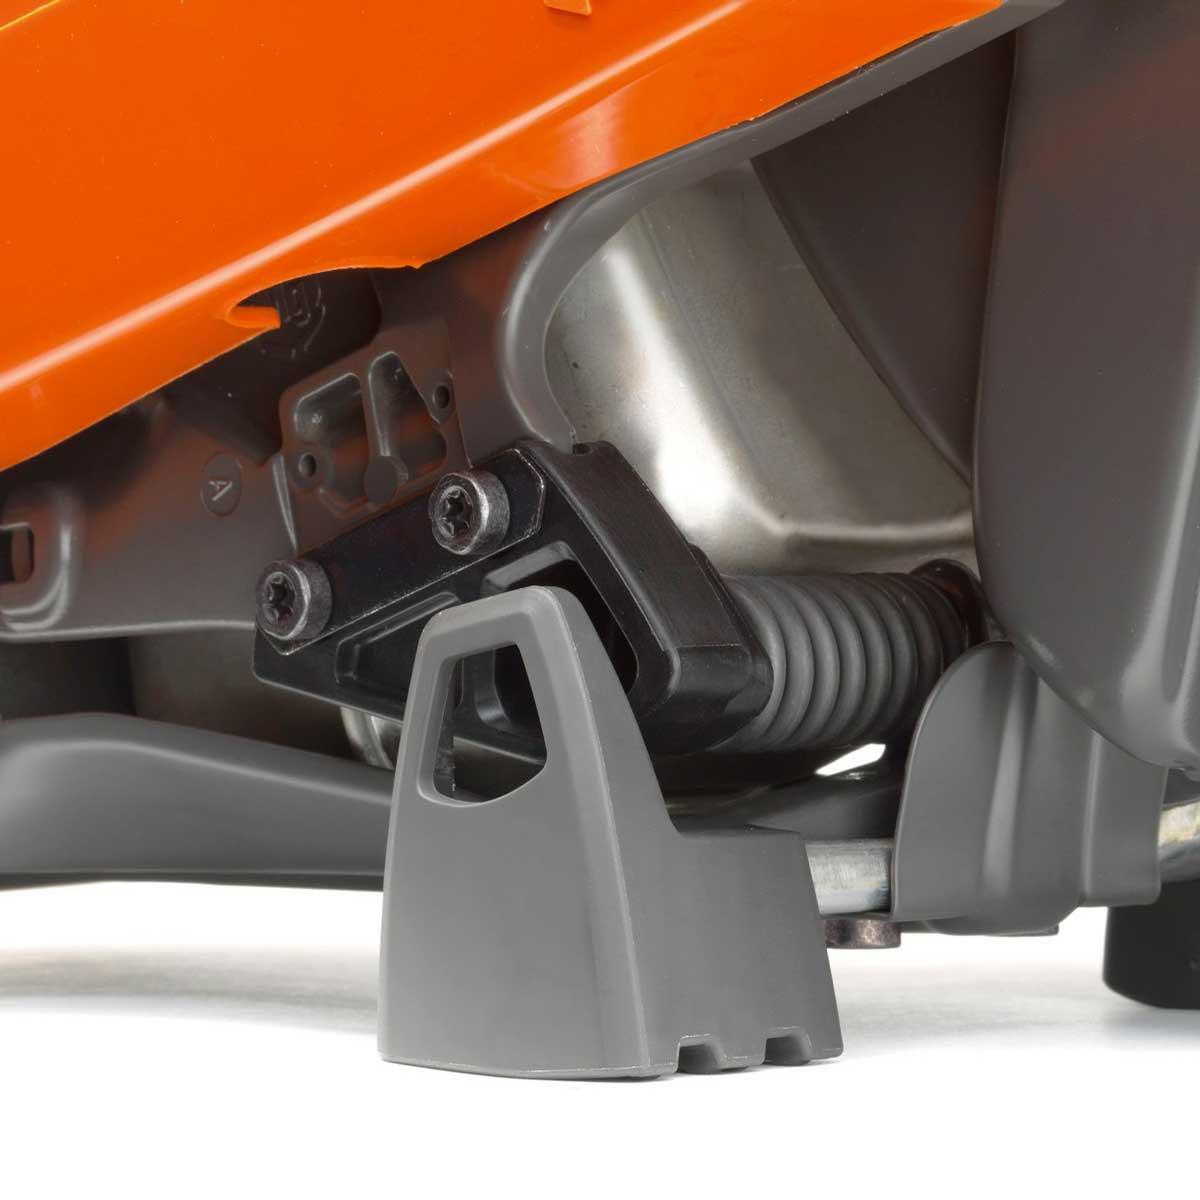 Husqvarna K760 II Power cutter feet